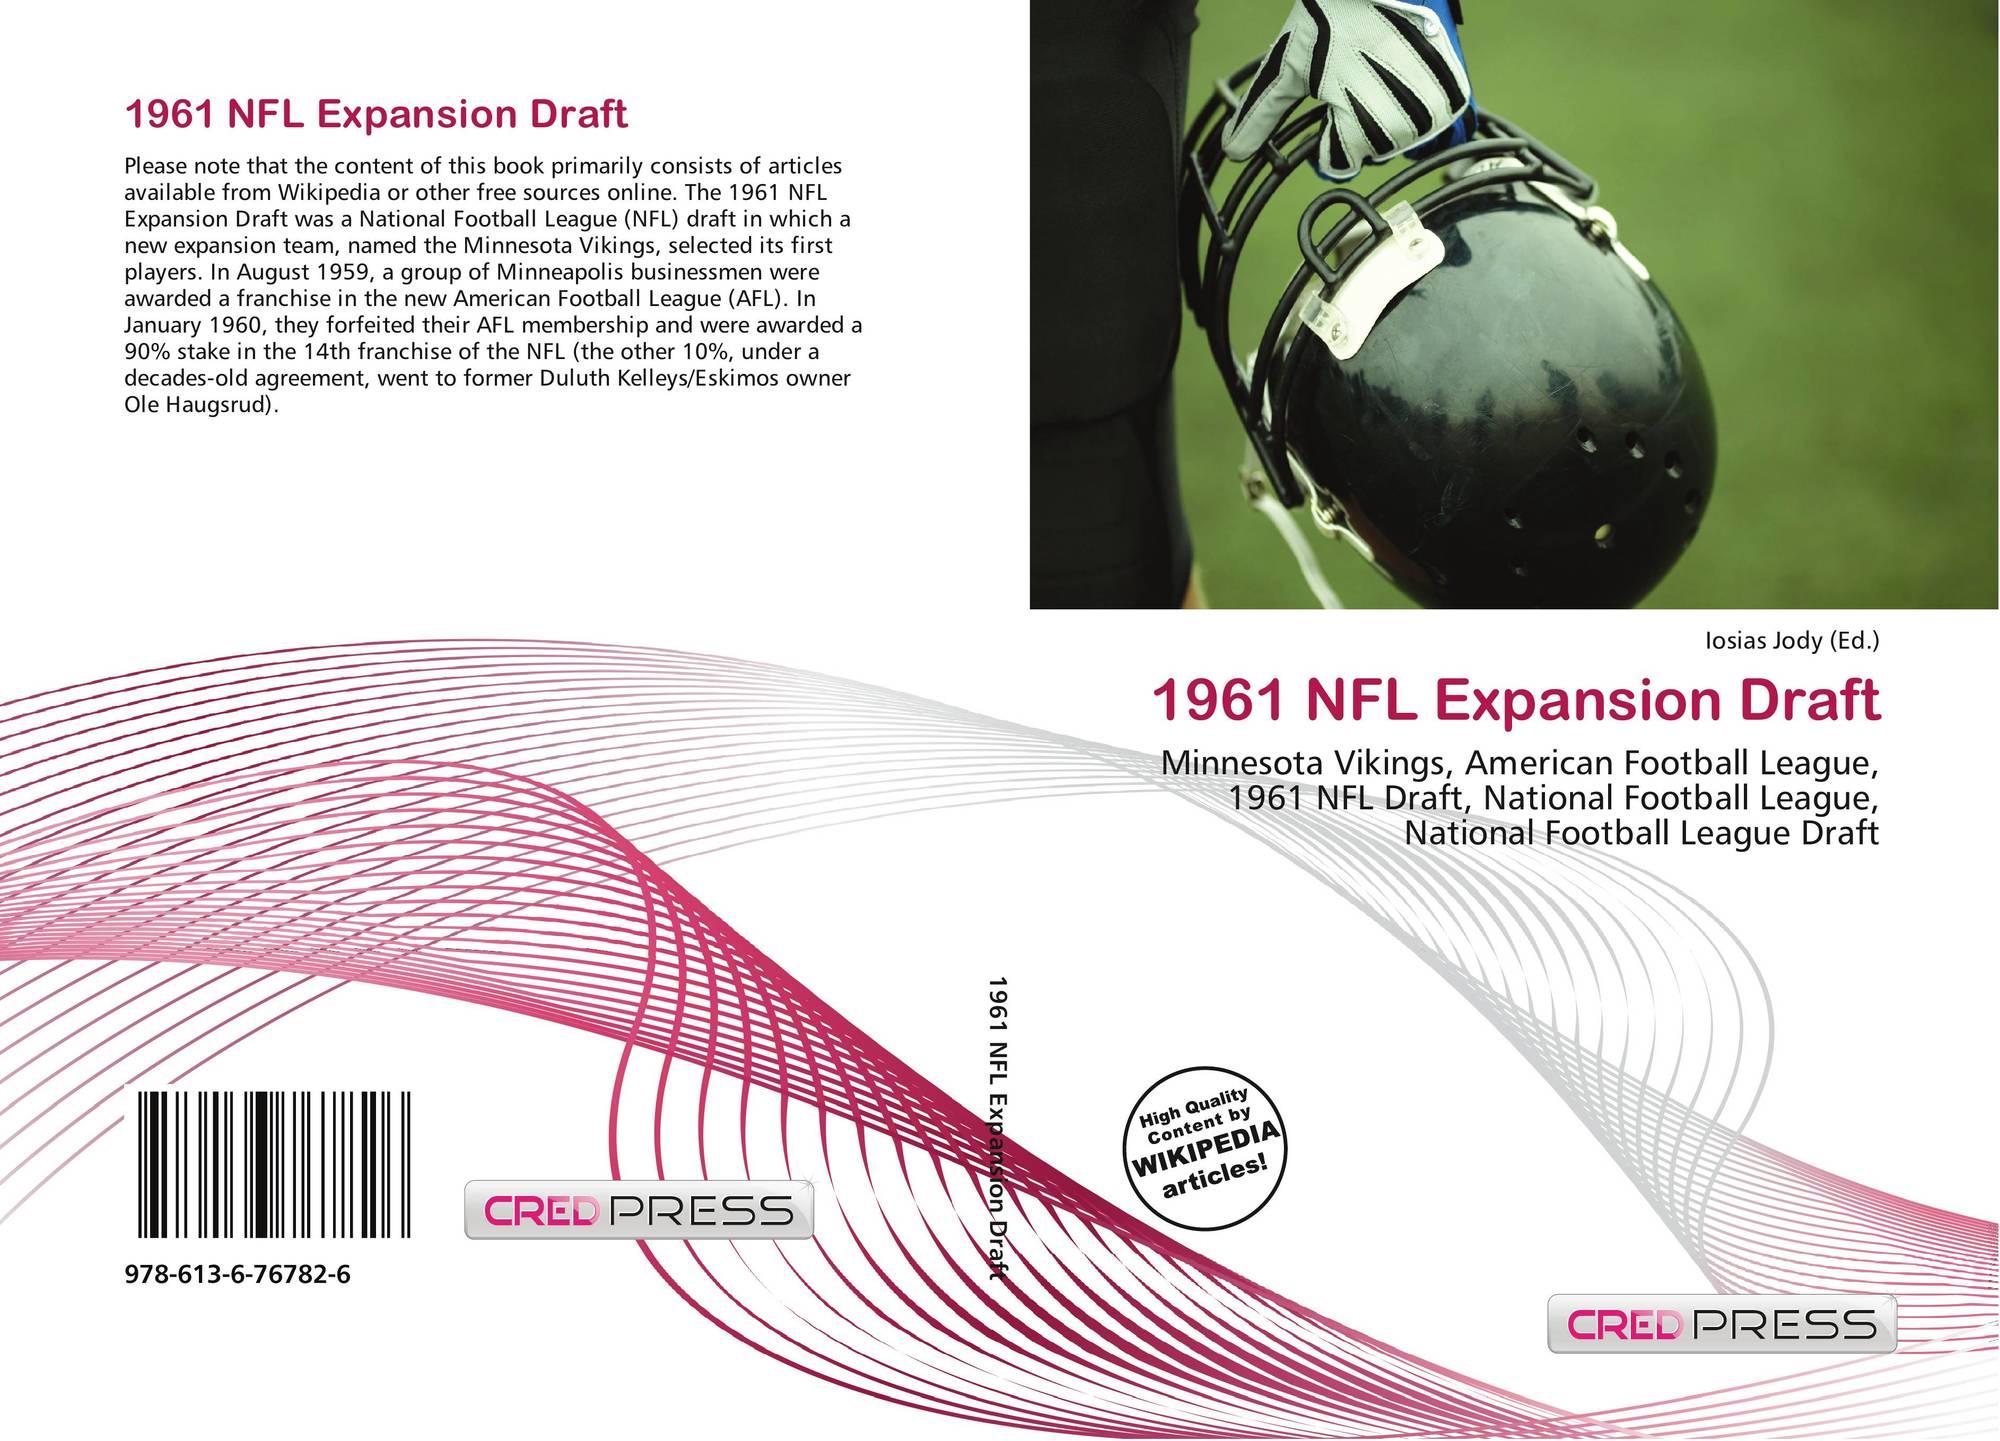 1961 NFL Draft